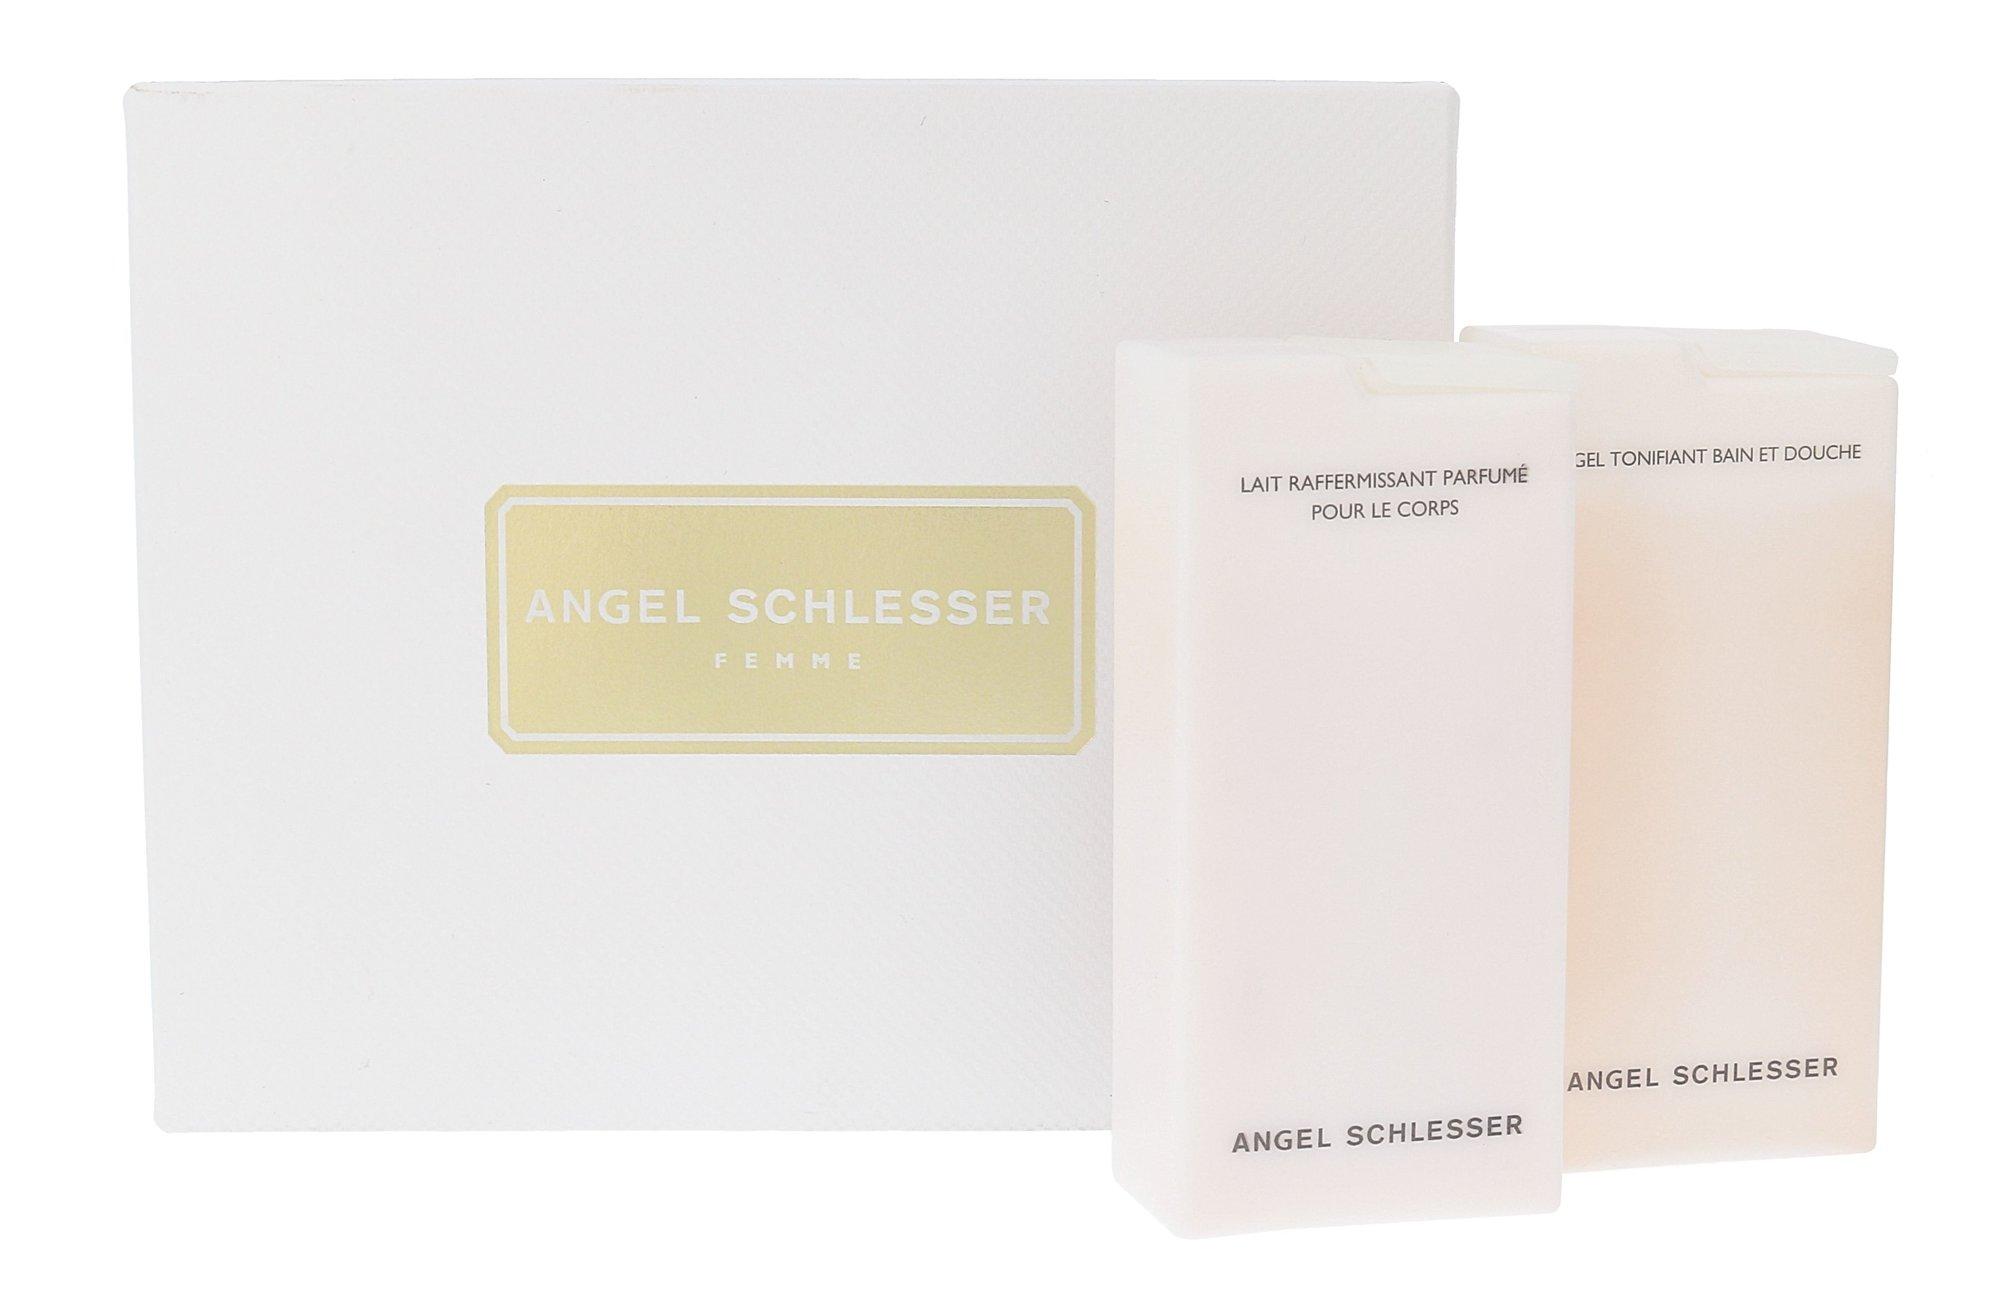 Angel Schlesser Femme Body lotion 75ml